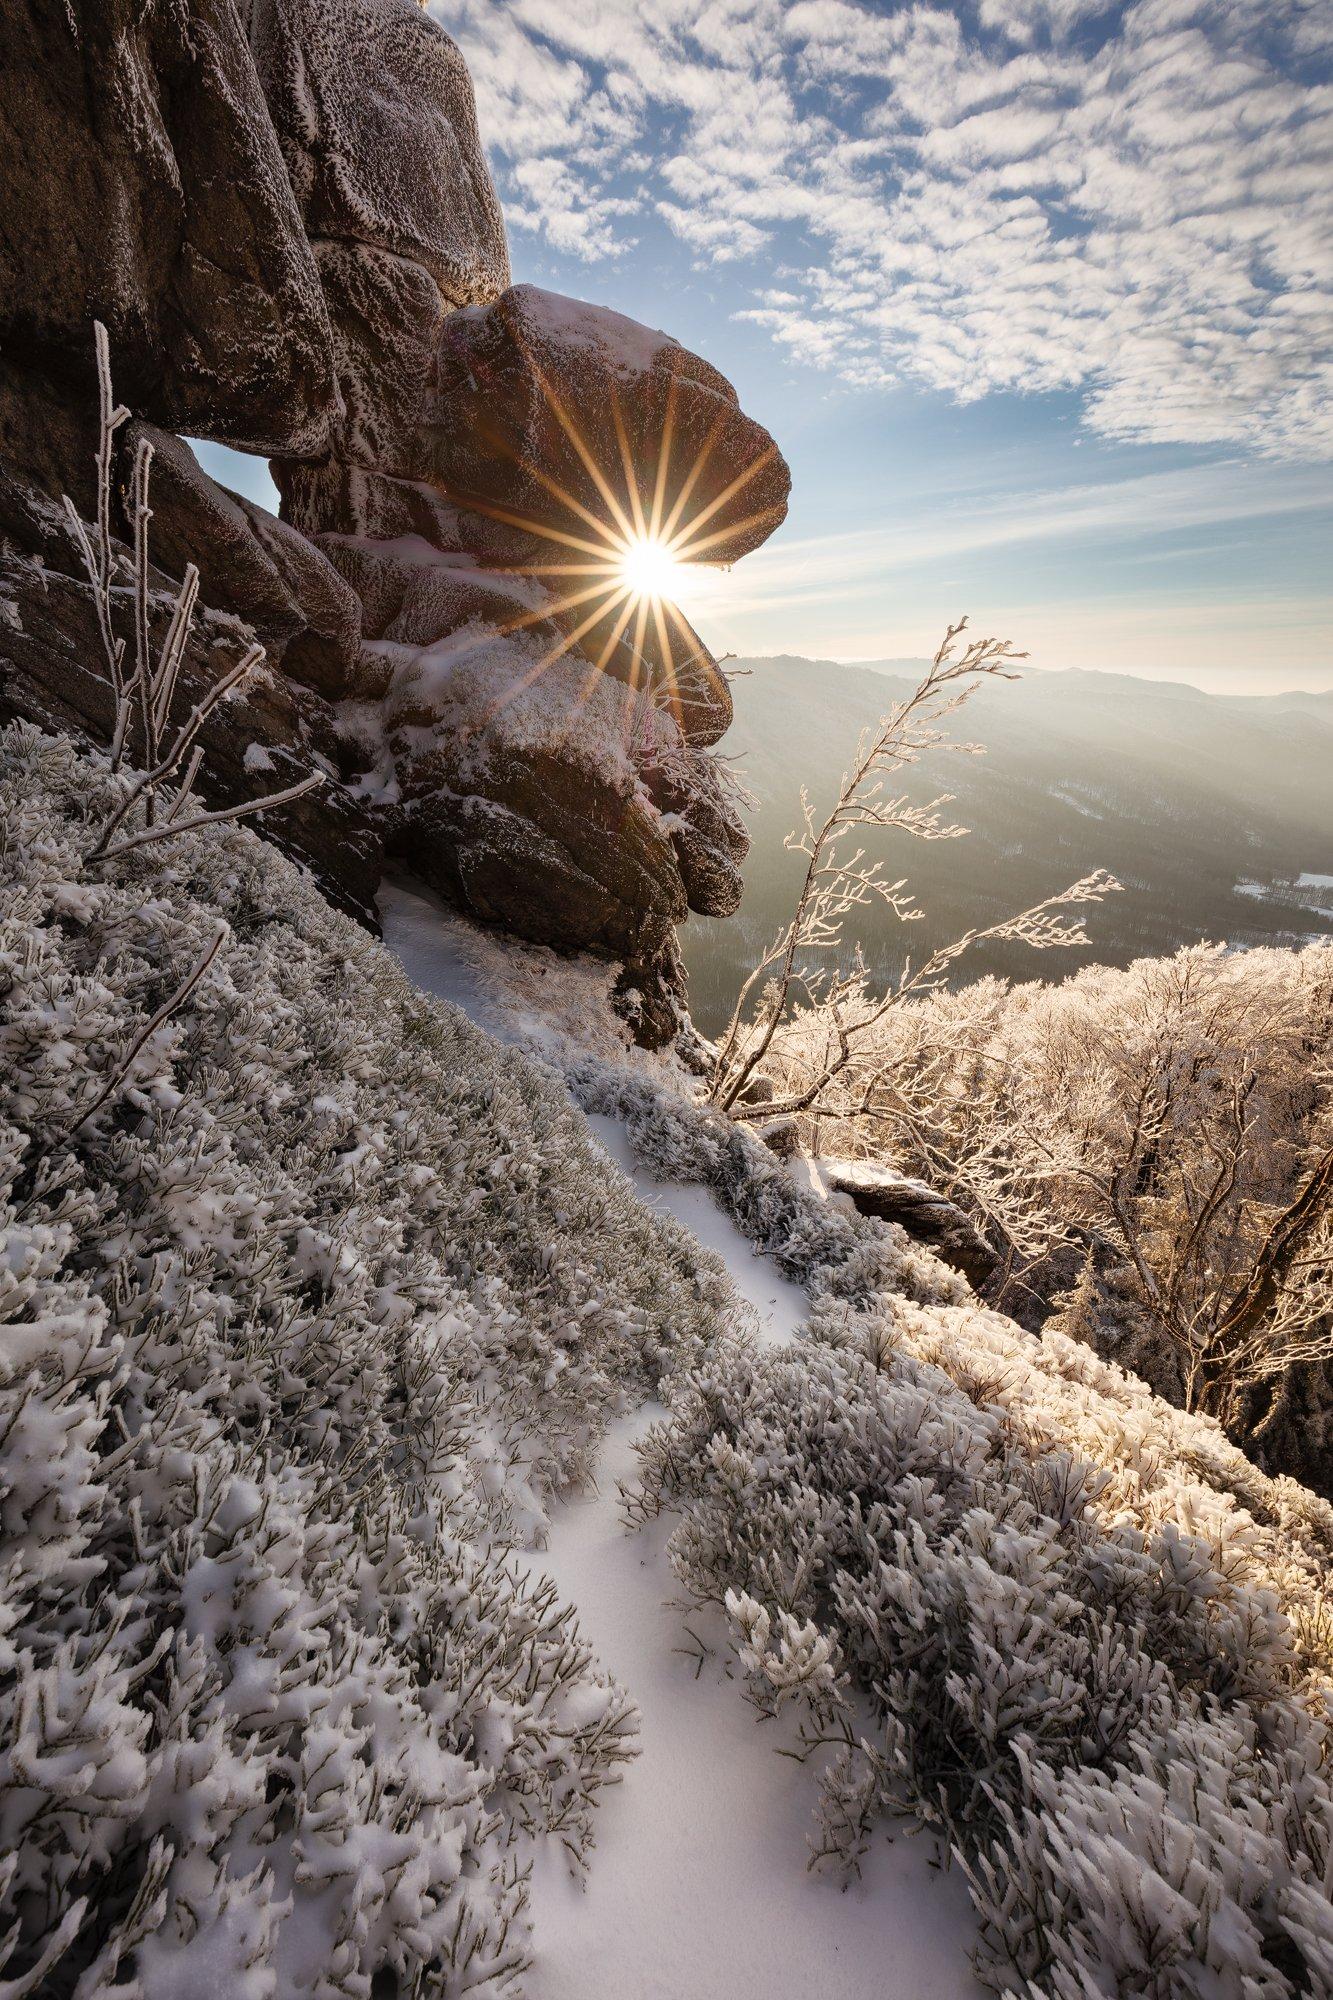 rock, sun, sunstar, winter, snow, czech republic, sky, clouds, czechia, landscape, mountains, Martin Rak